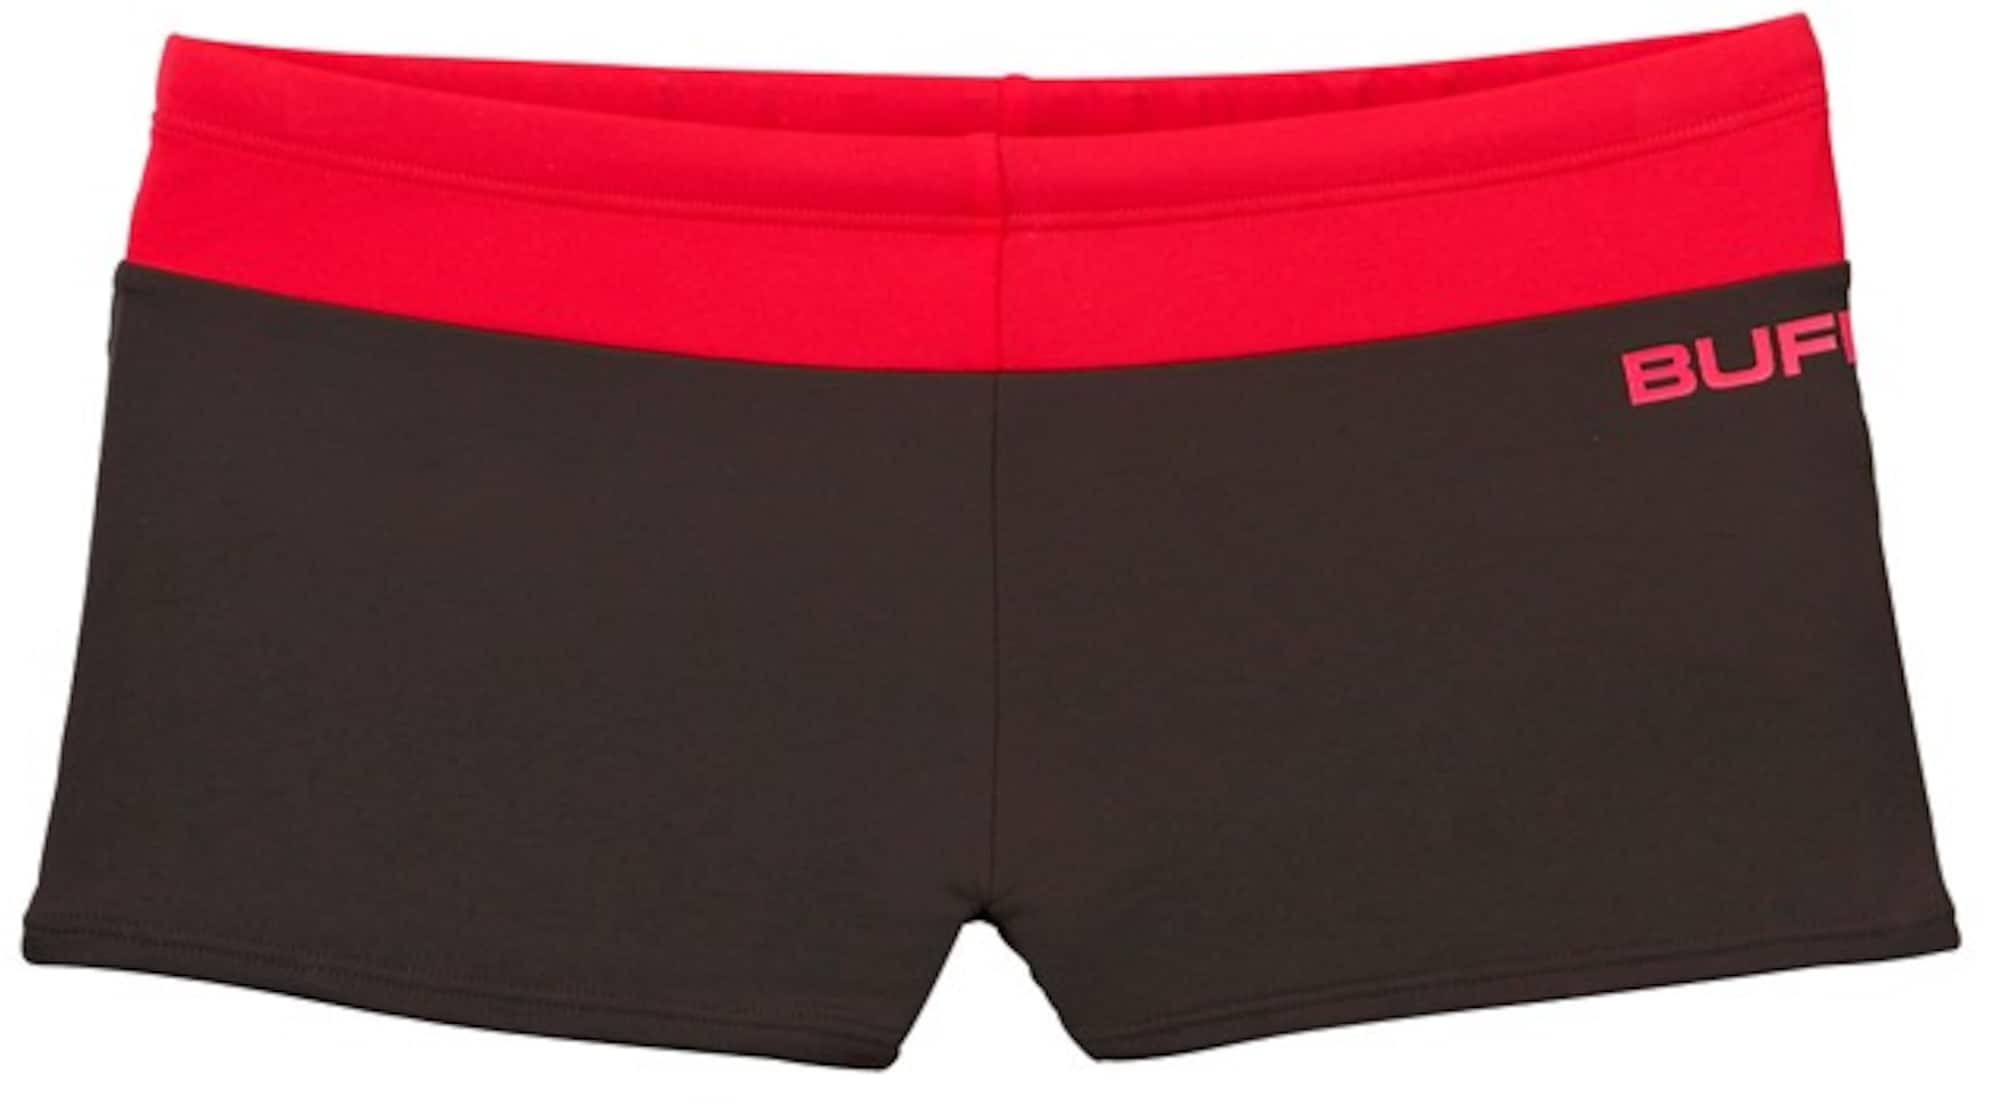 Boxer-Badehose   Bekleidung > Bademode > Boxerbadehosen   Rot - Schwarz   Buffalo